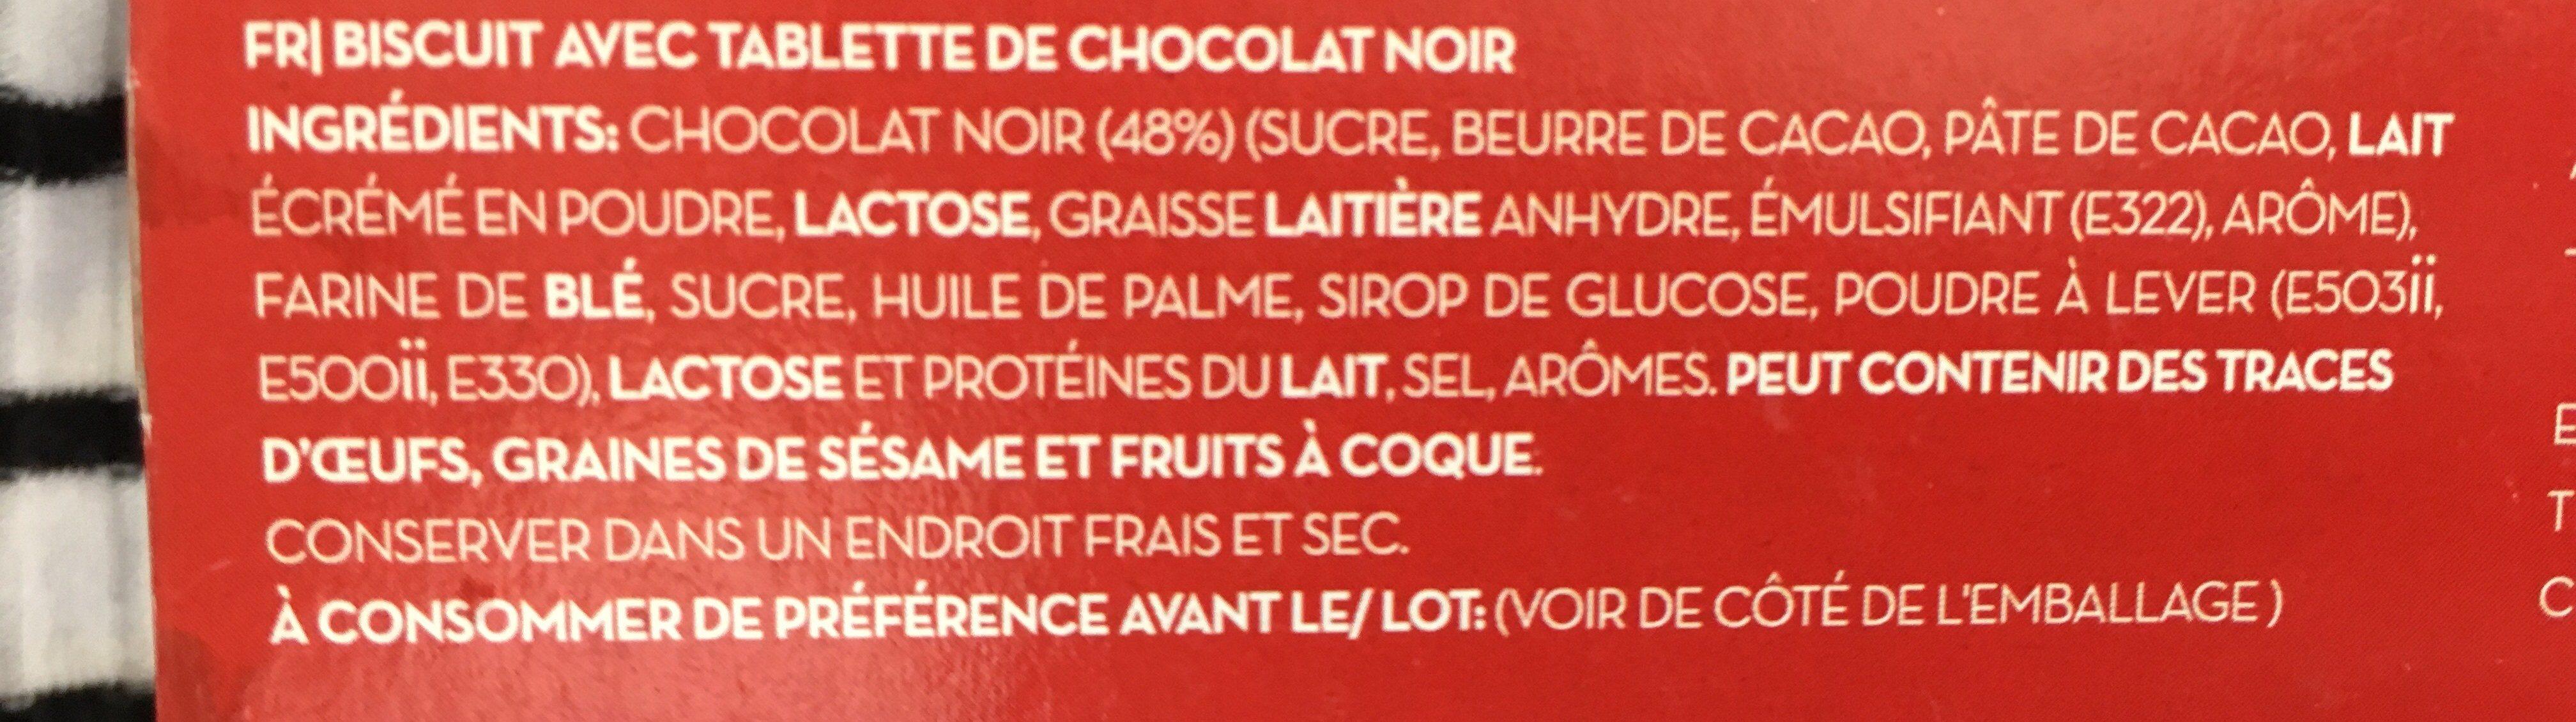 Bolacha coberta com chocolate negro - Ingredients